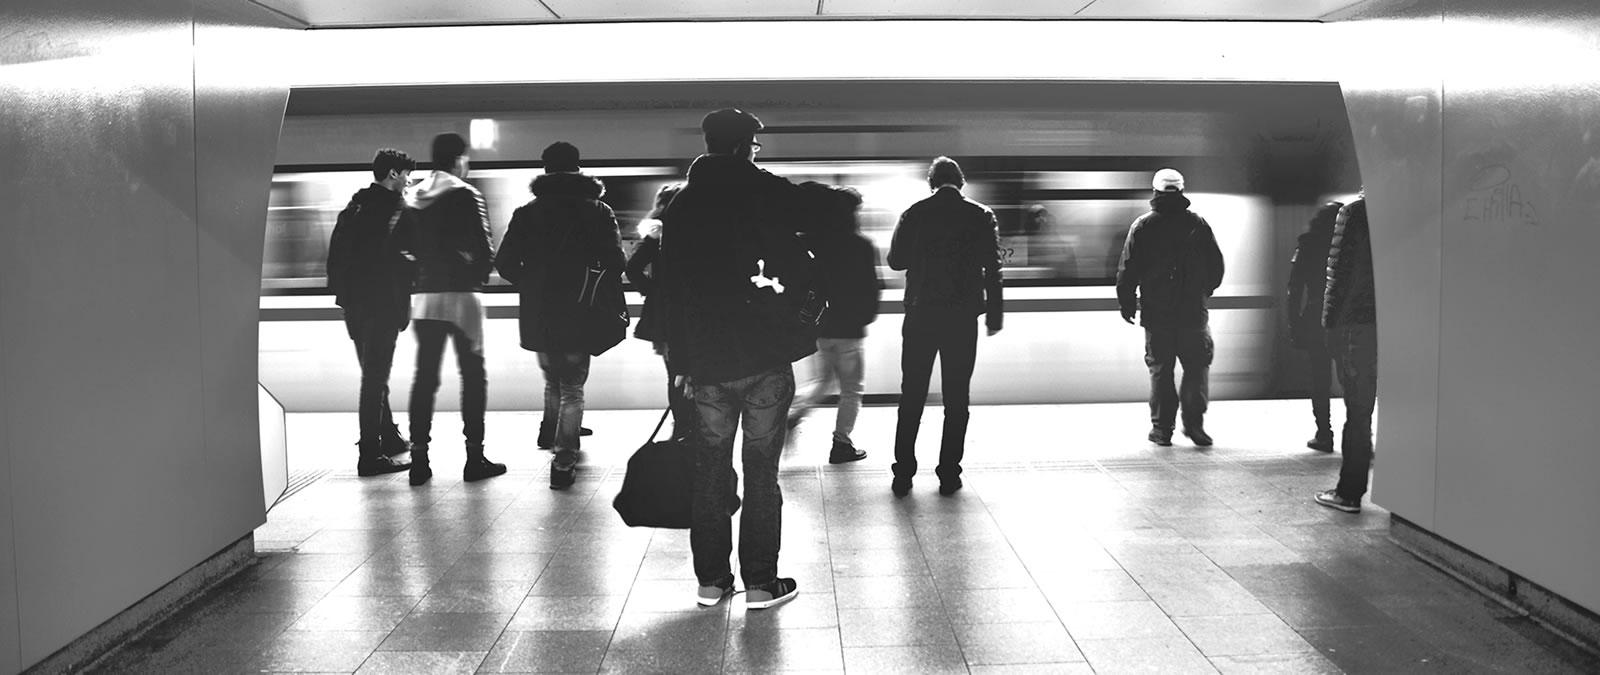 Metro Bogotá Colombia